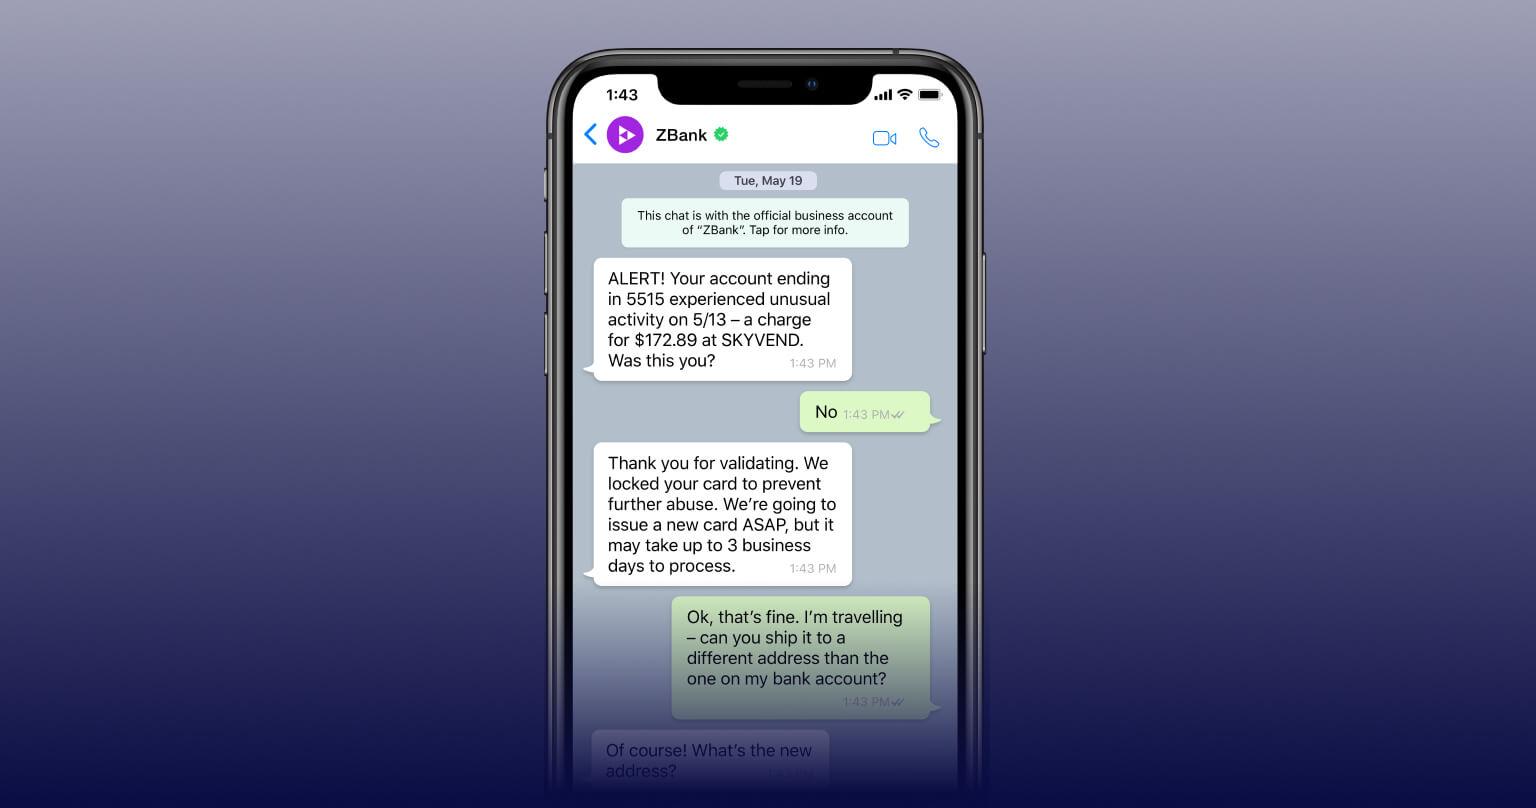 WhatsApp conversation between a consumer and bank